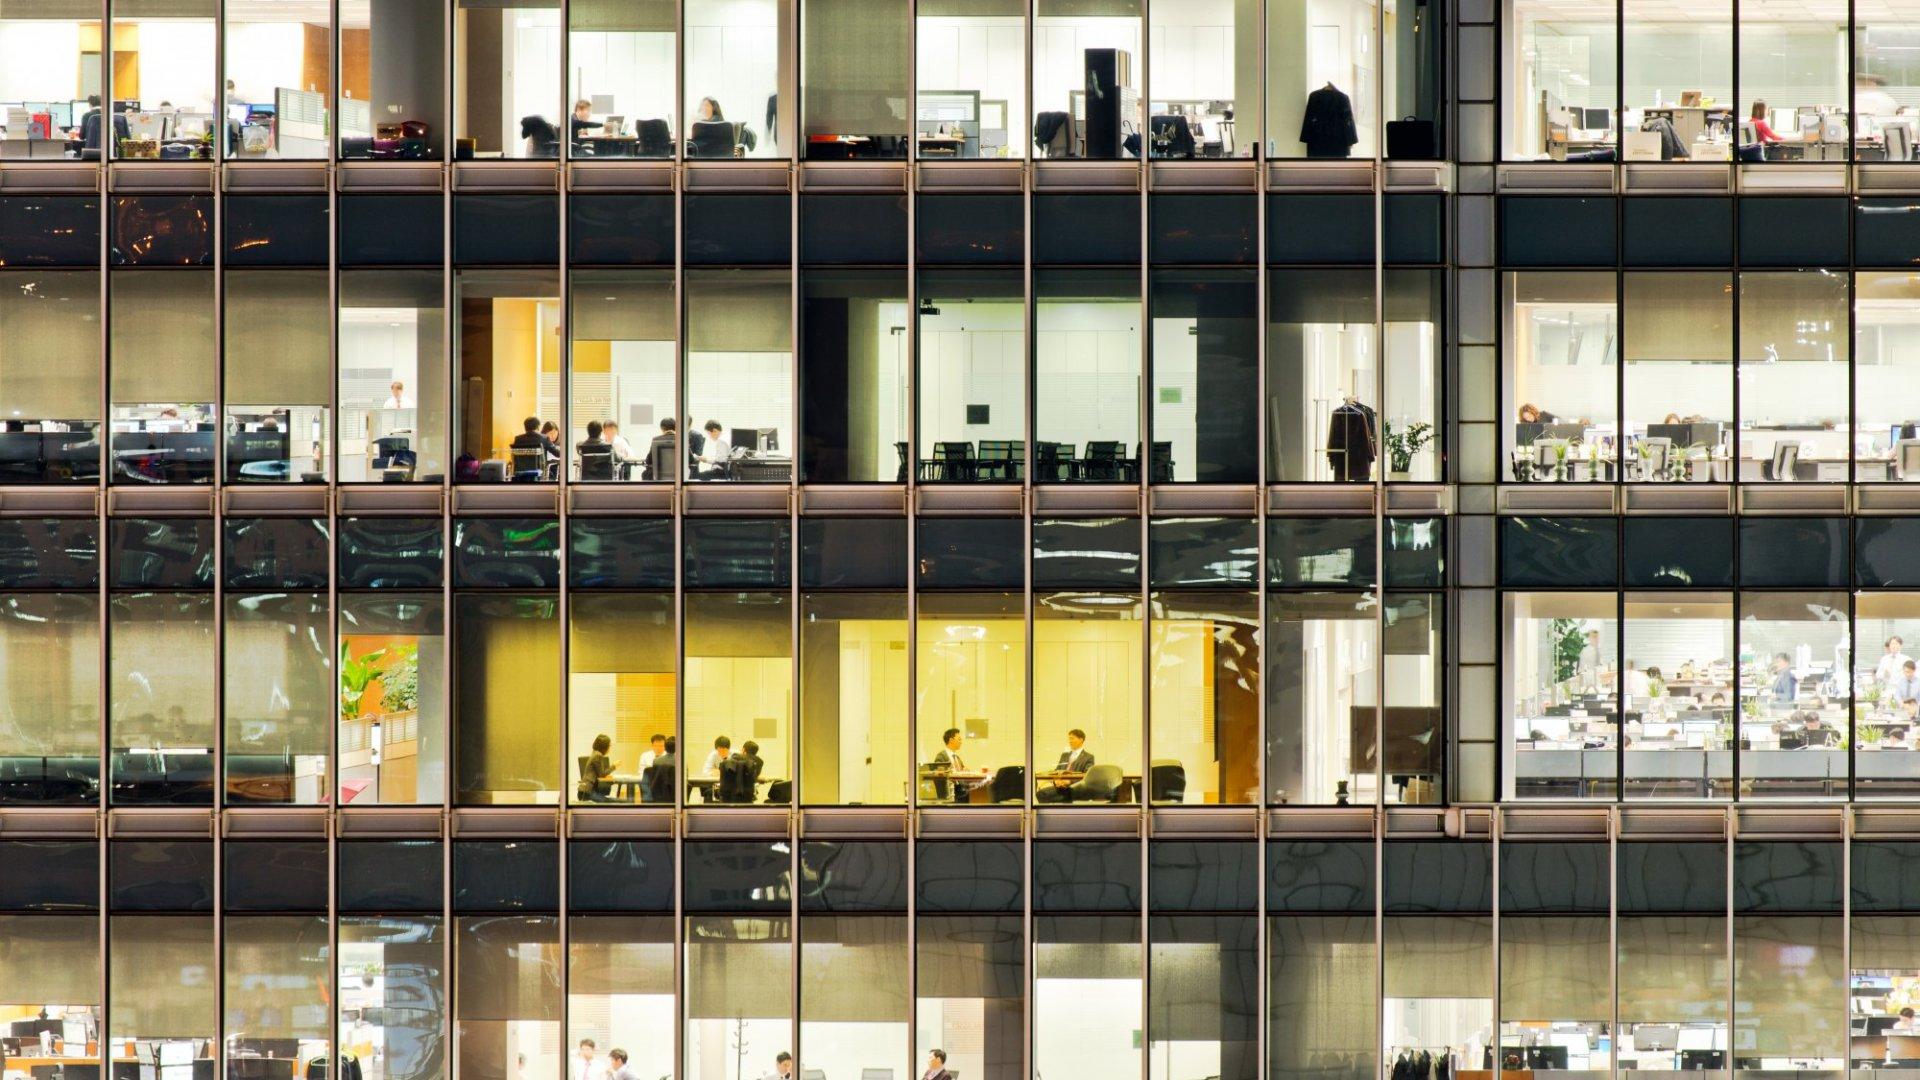 U.S. Employers Add 223,000 Jobs in May